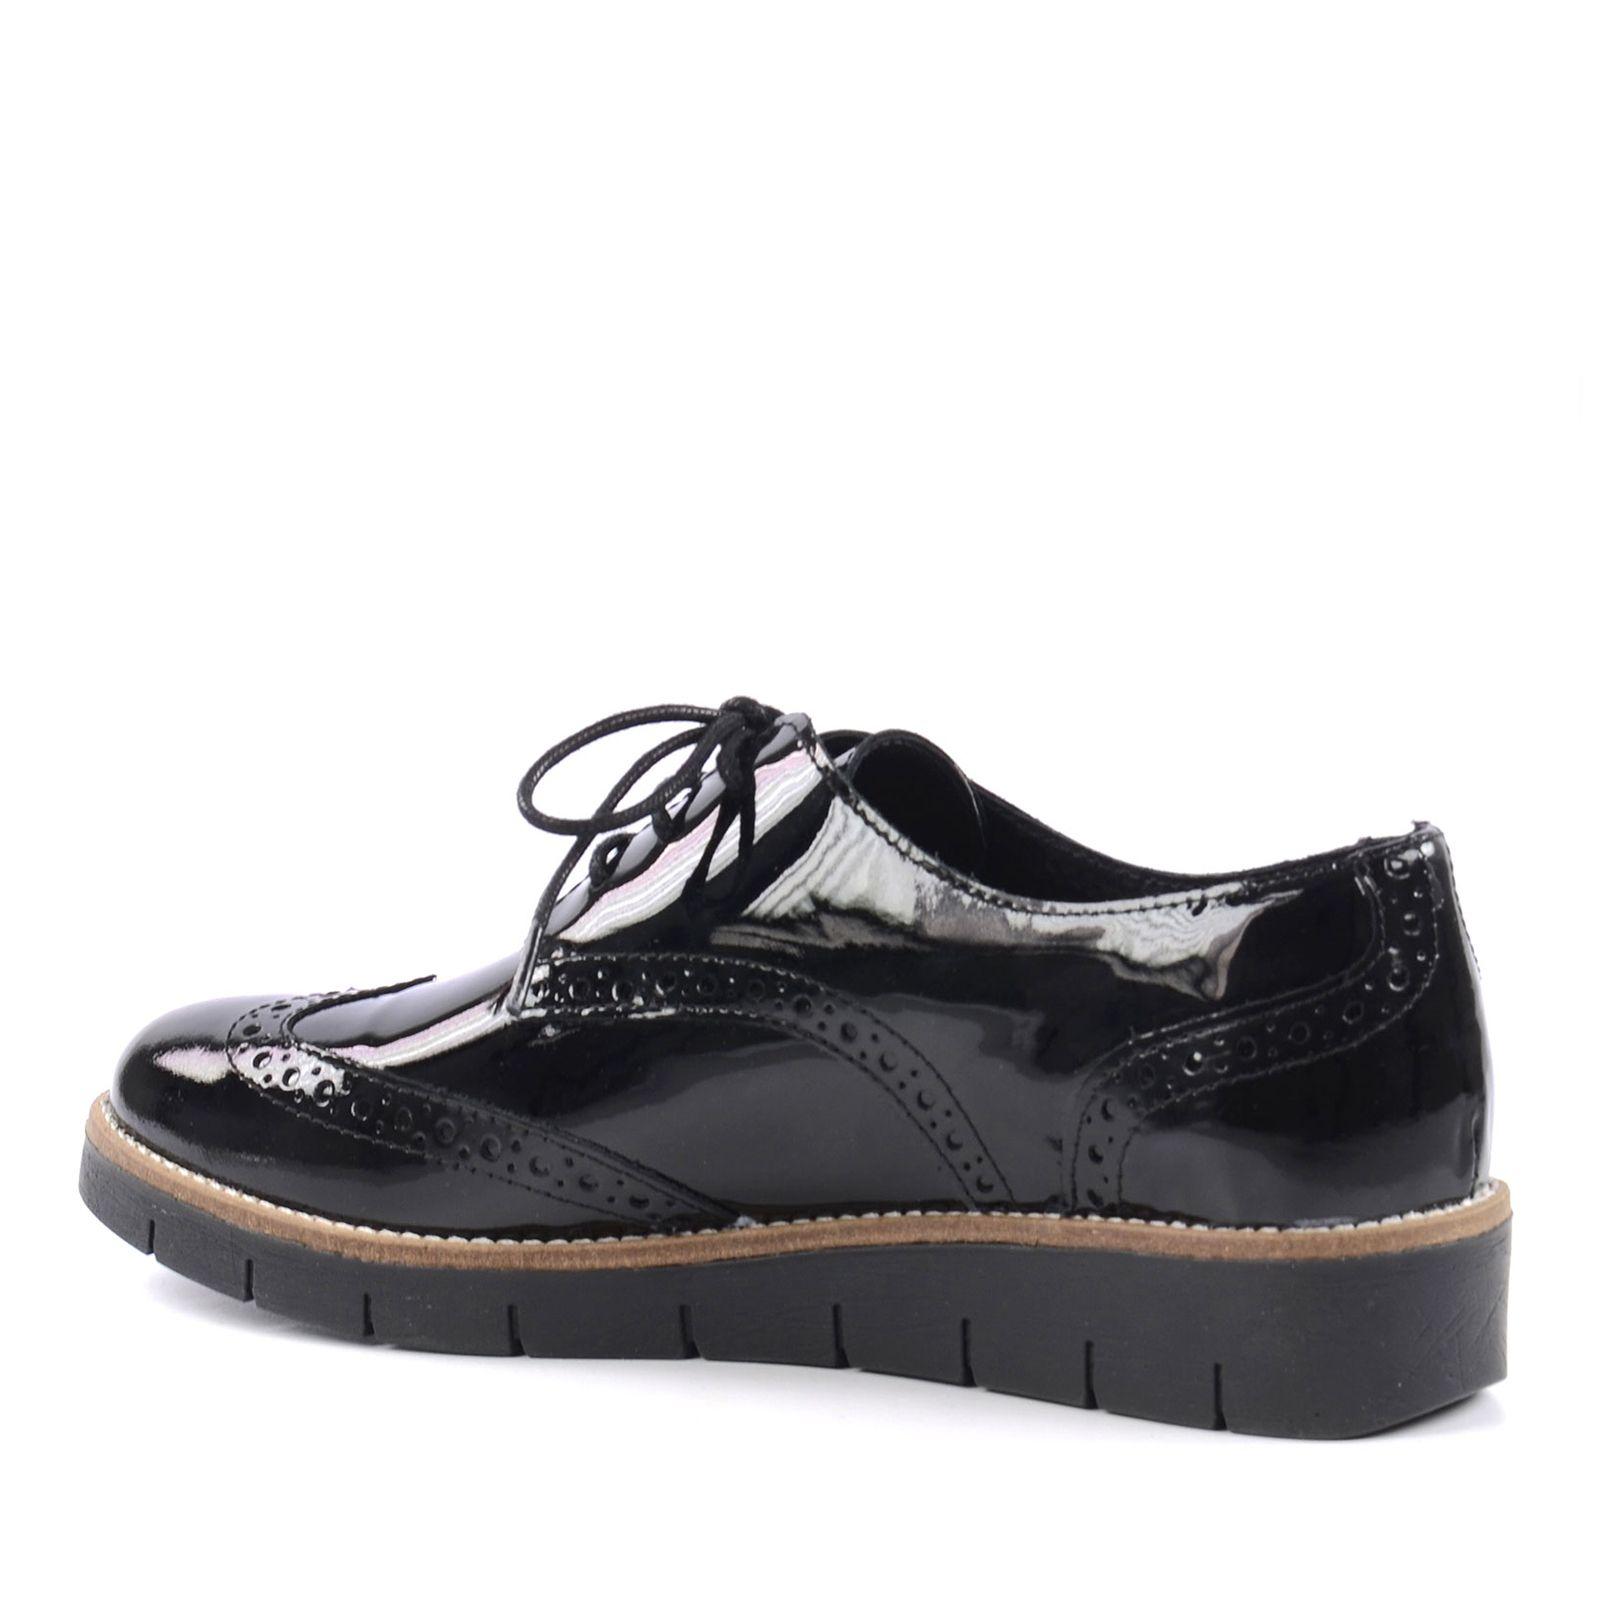 chaussures plateau brogue noir femmes. Black Bedroom Furniture Sets. Home Design Ideas